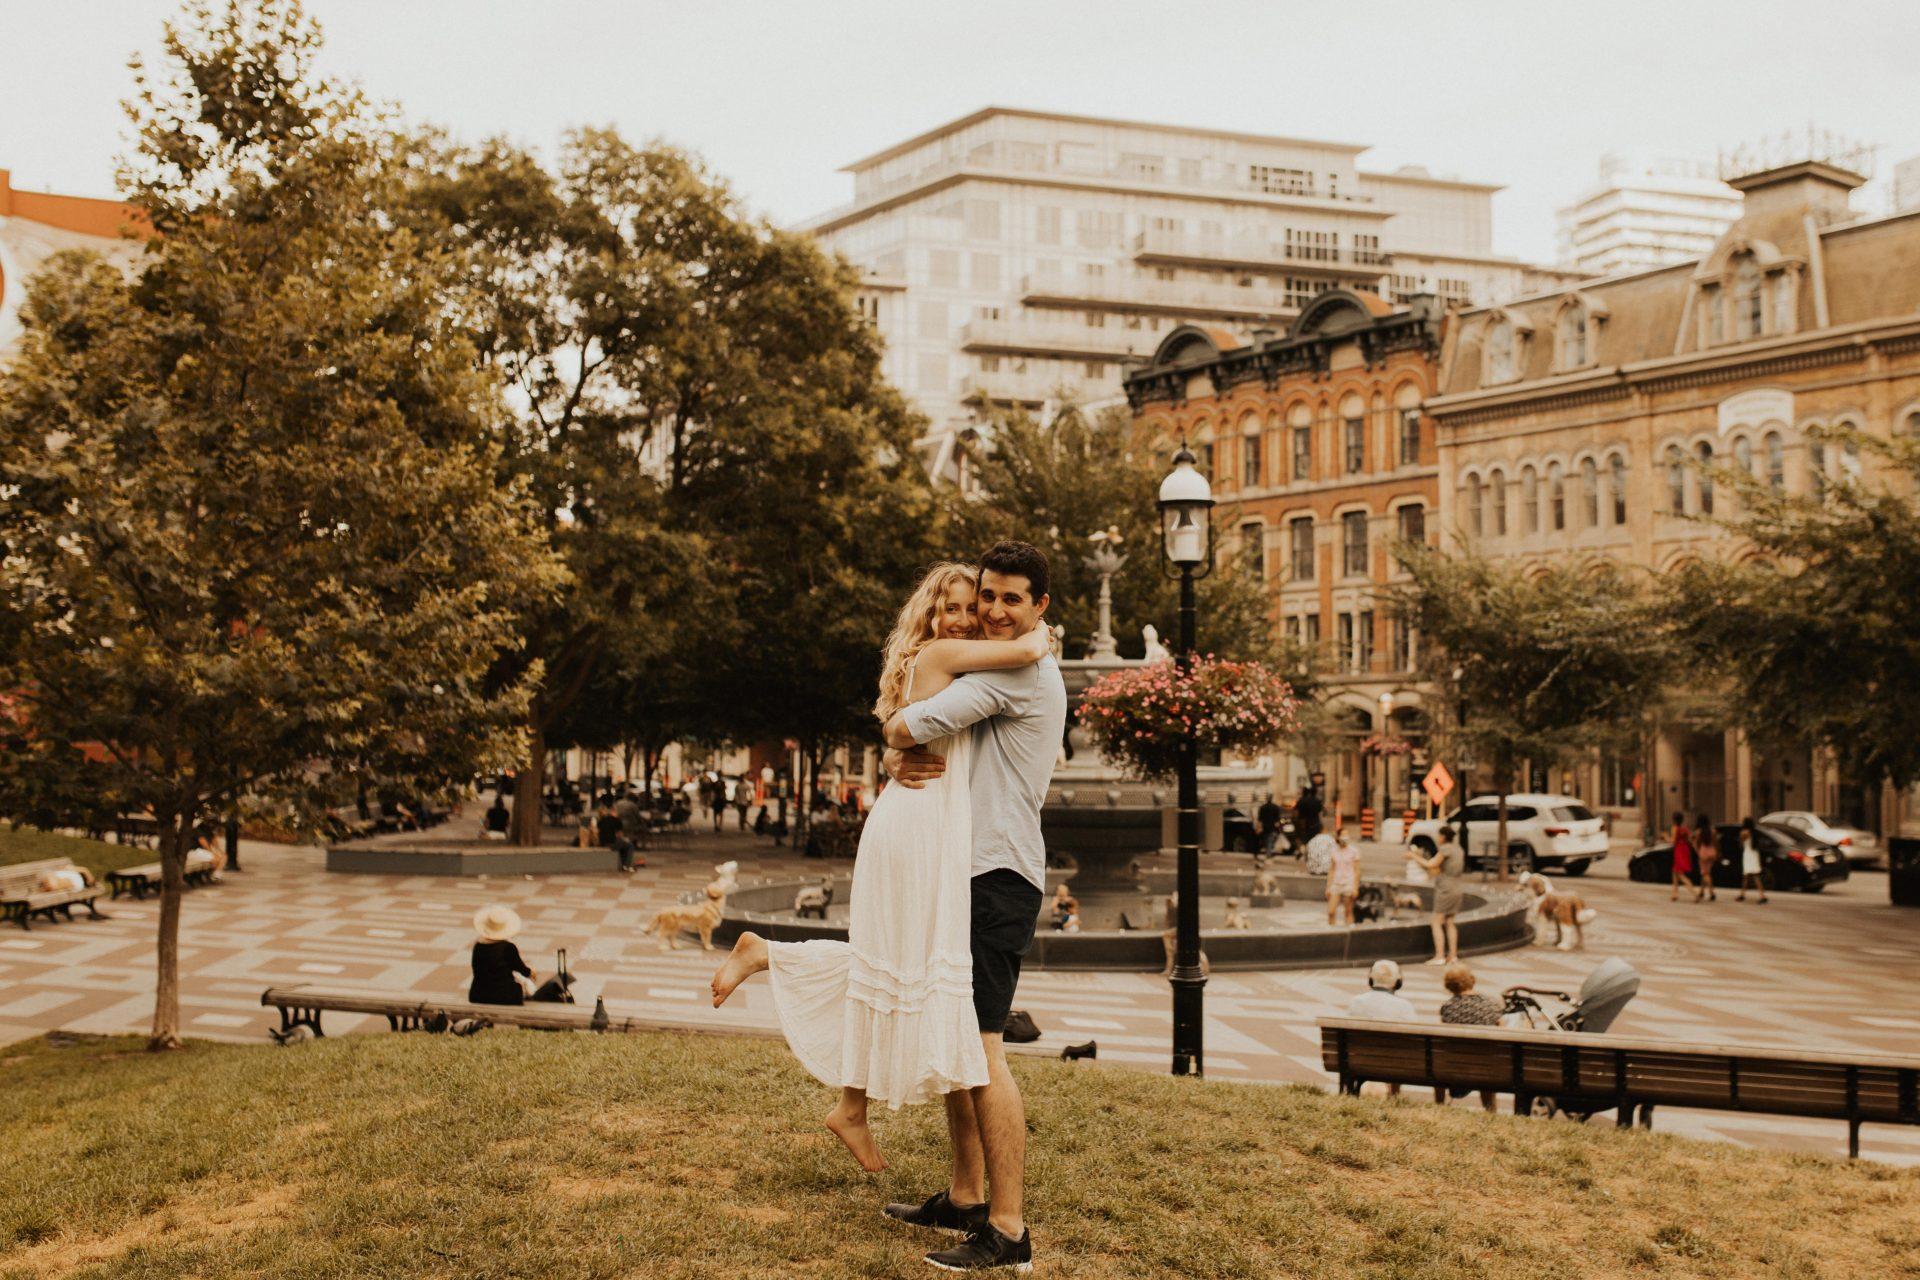 berczy park engagement photos